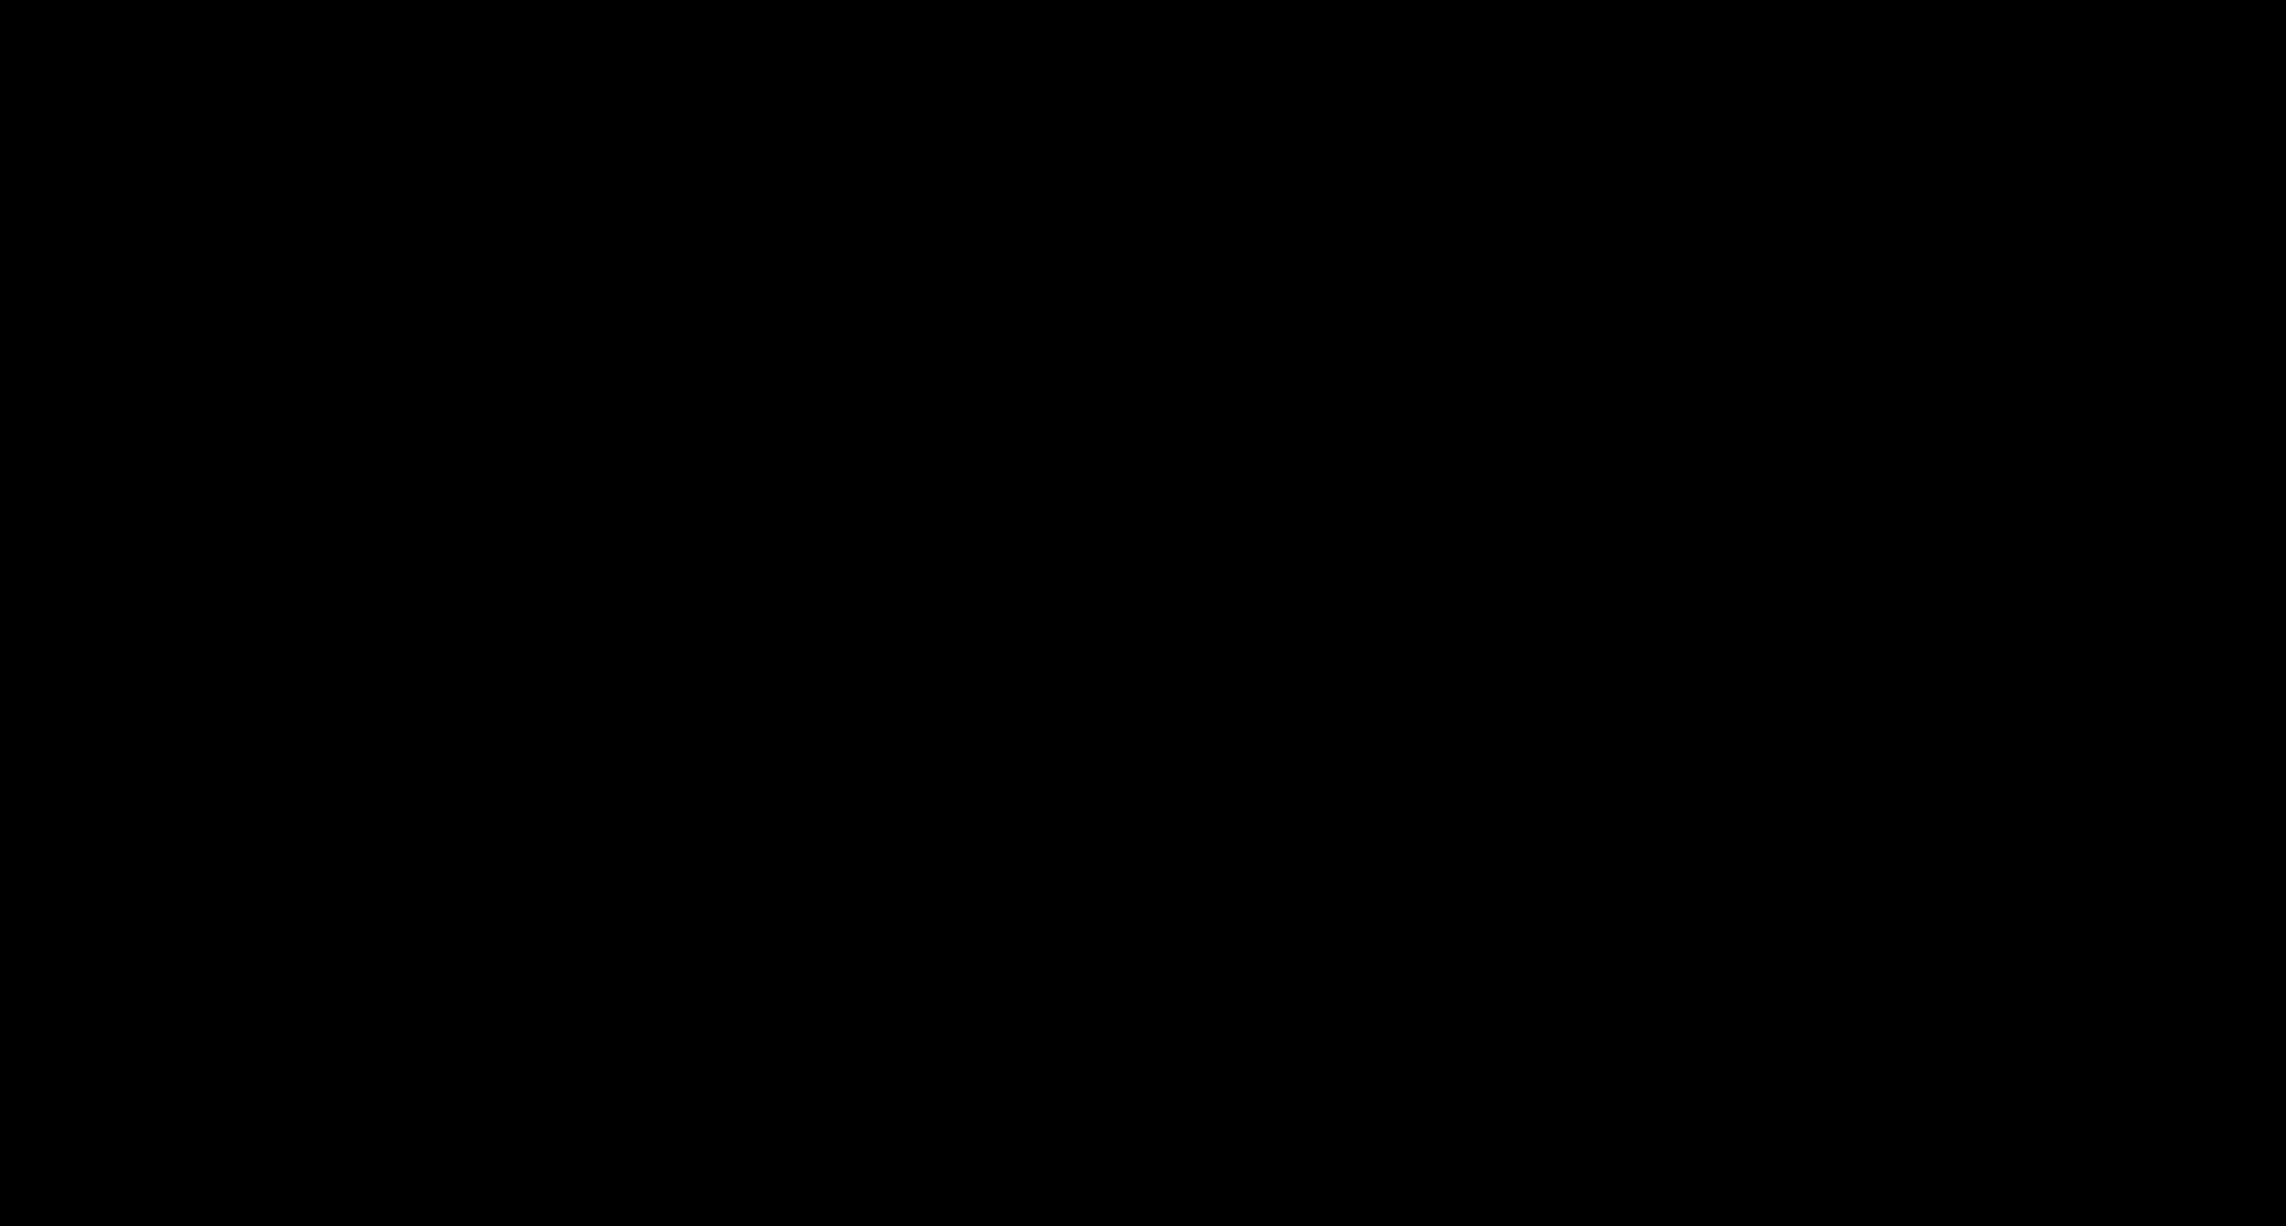 openwordpress